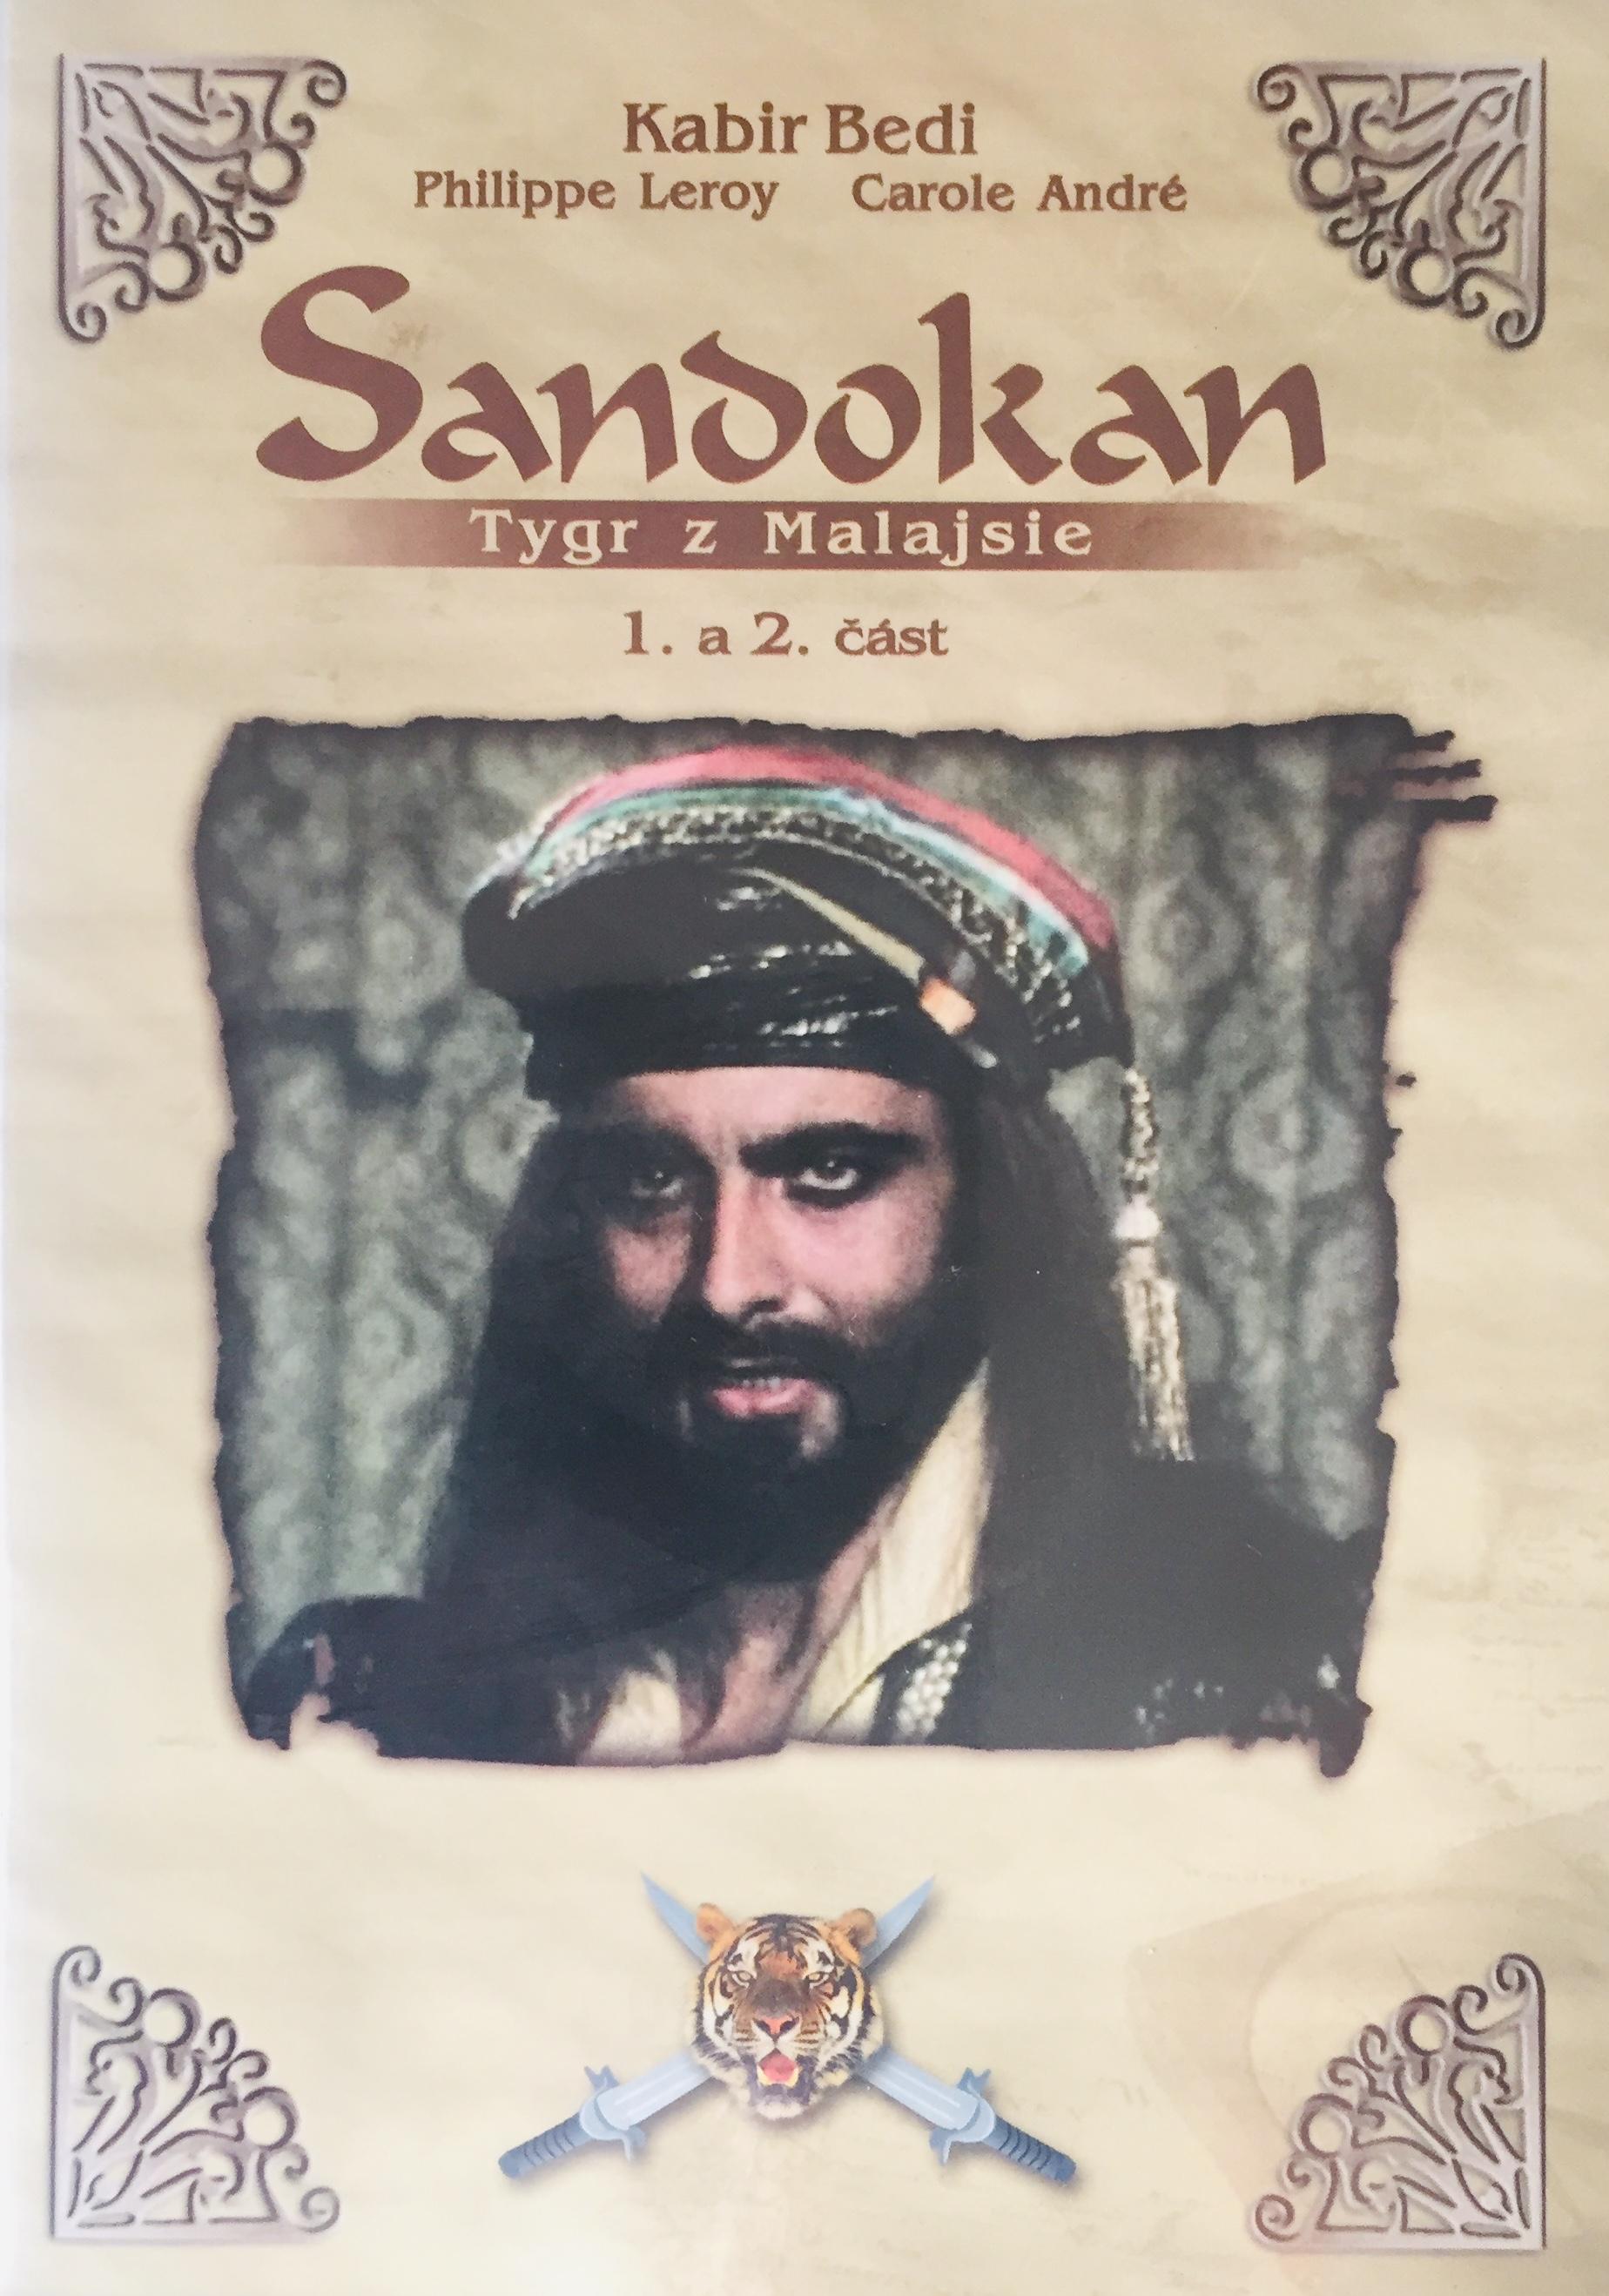 Sandokan - Tygr z Malajsie - 1. a 2. část - DVD /plast/